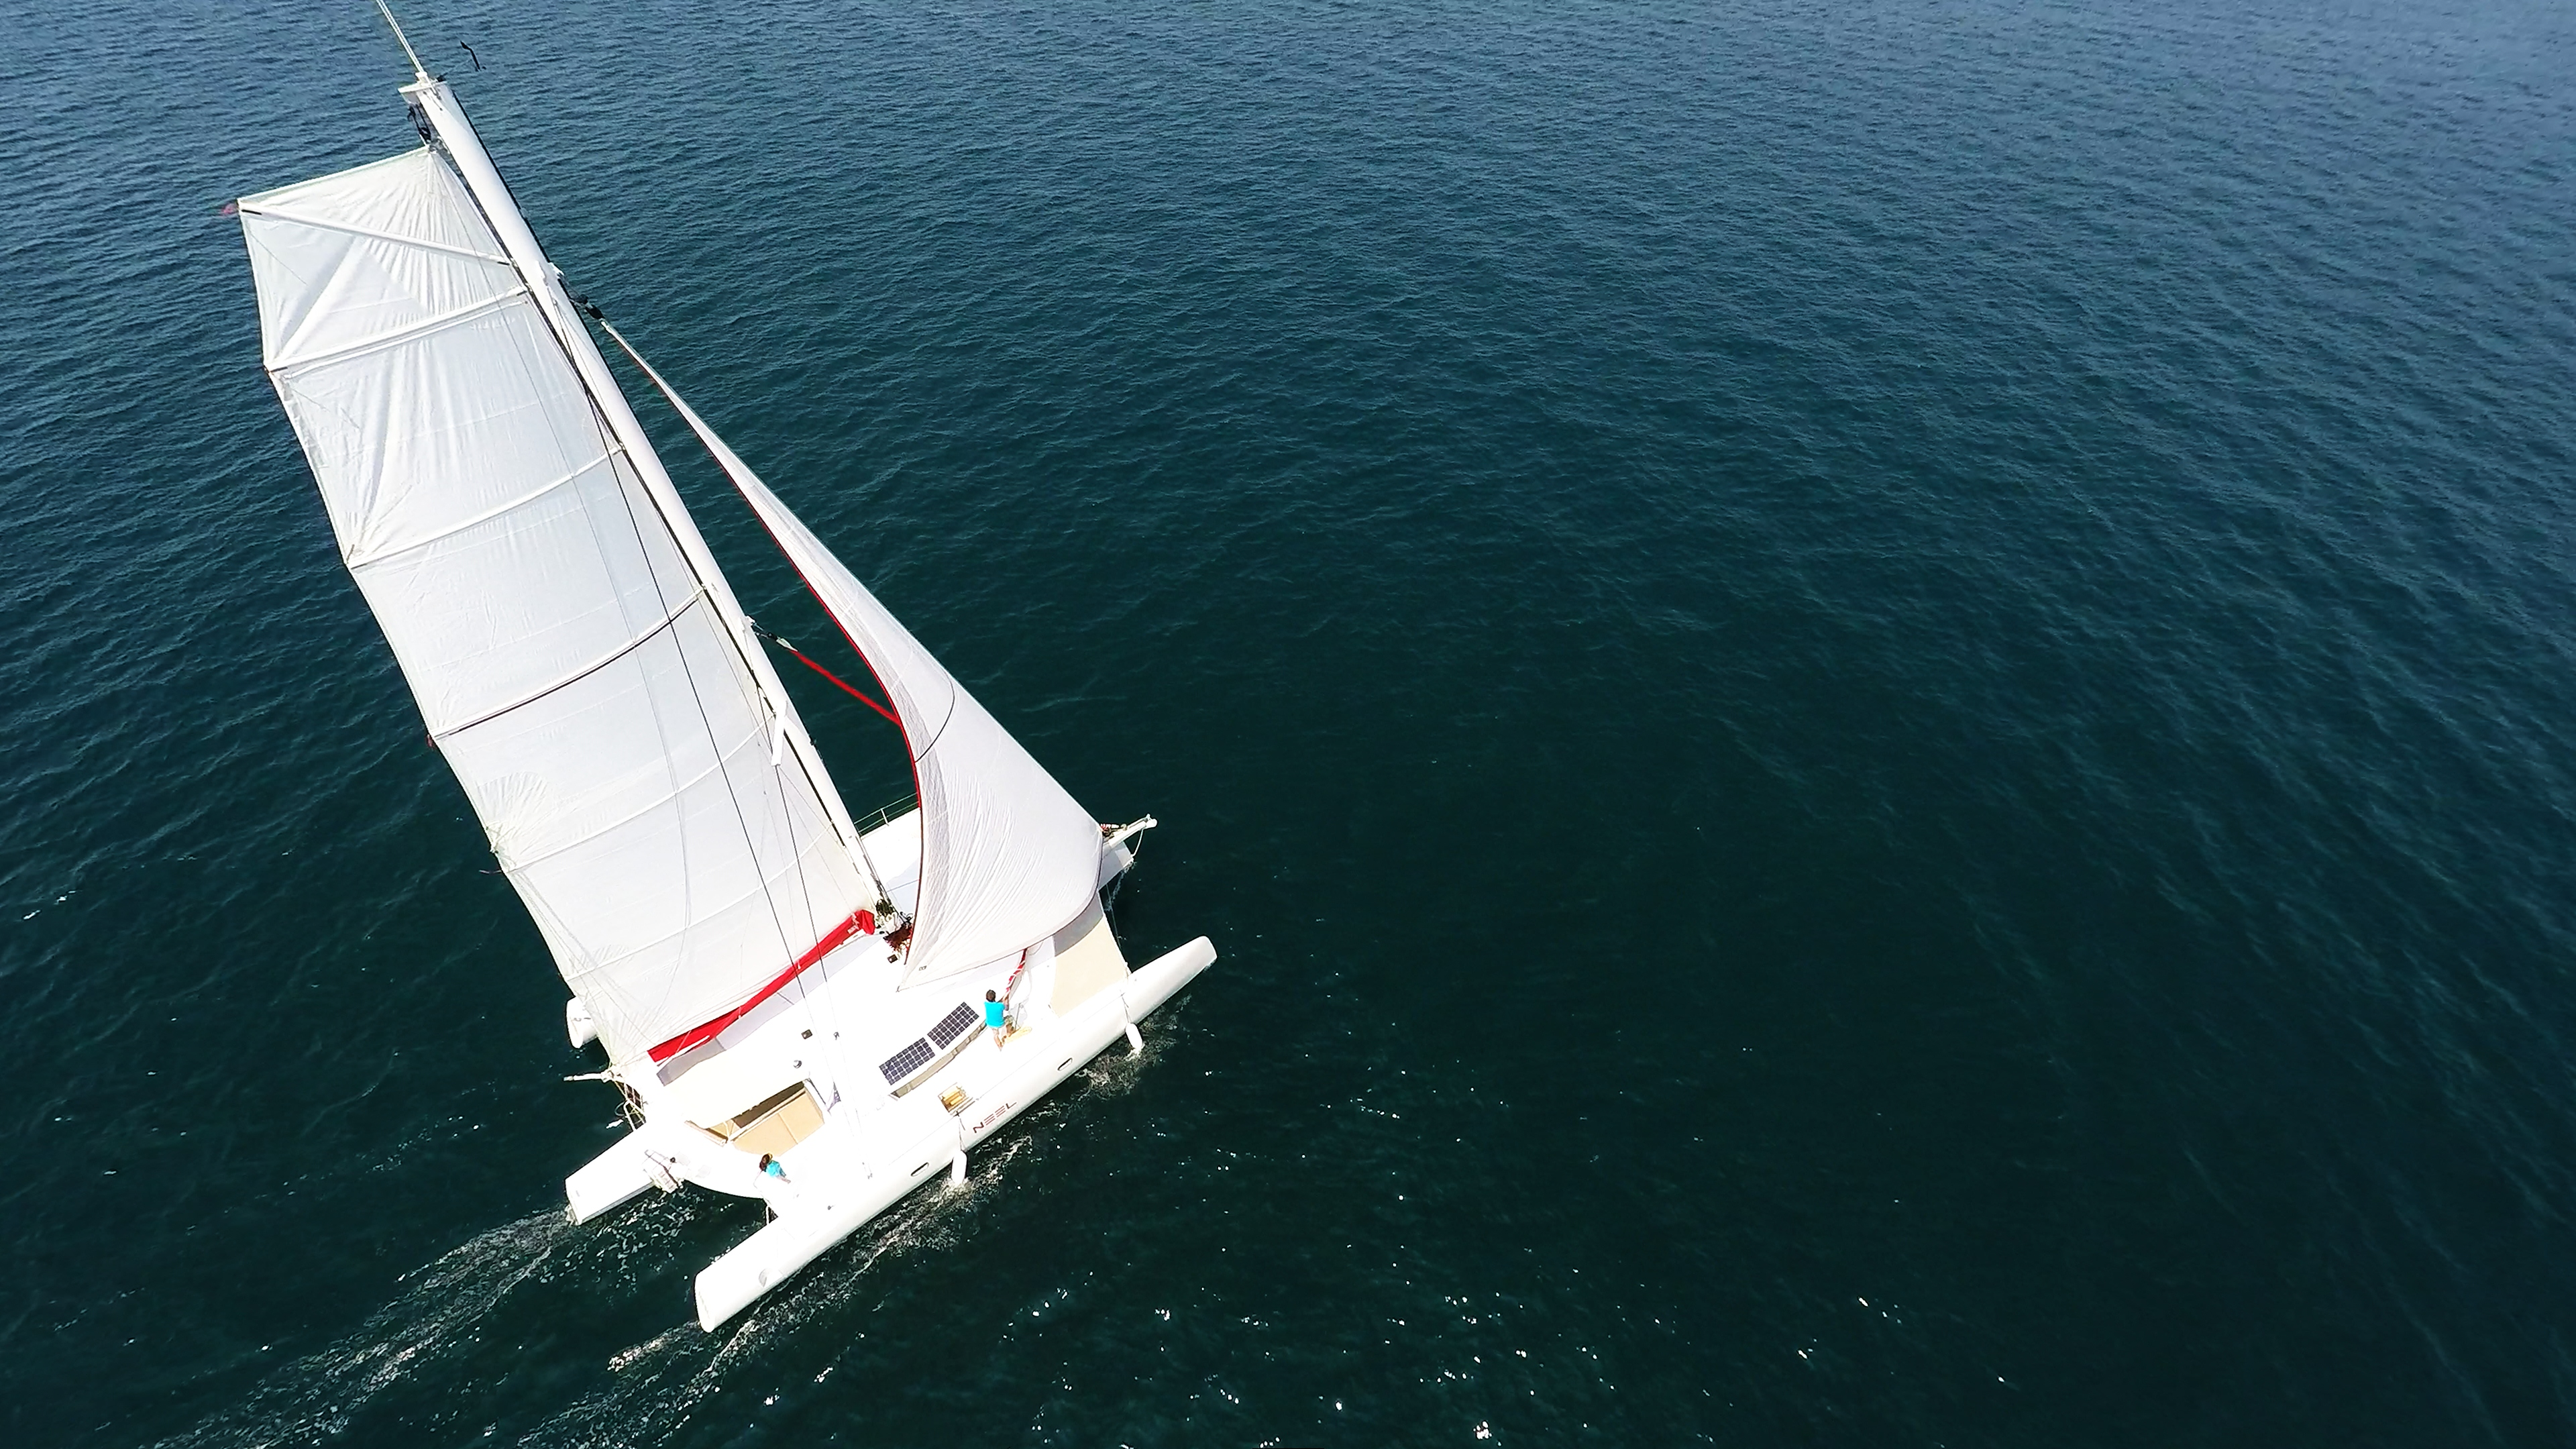 foto aerea di trimarano  yacht a noleggio vela